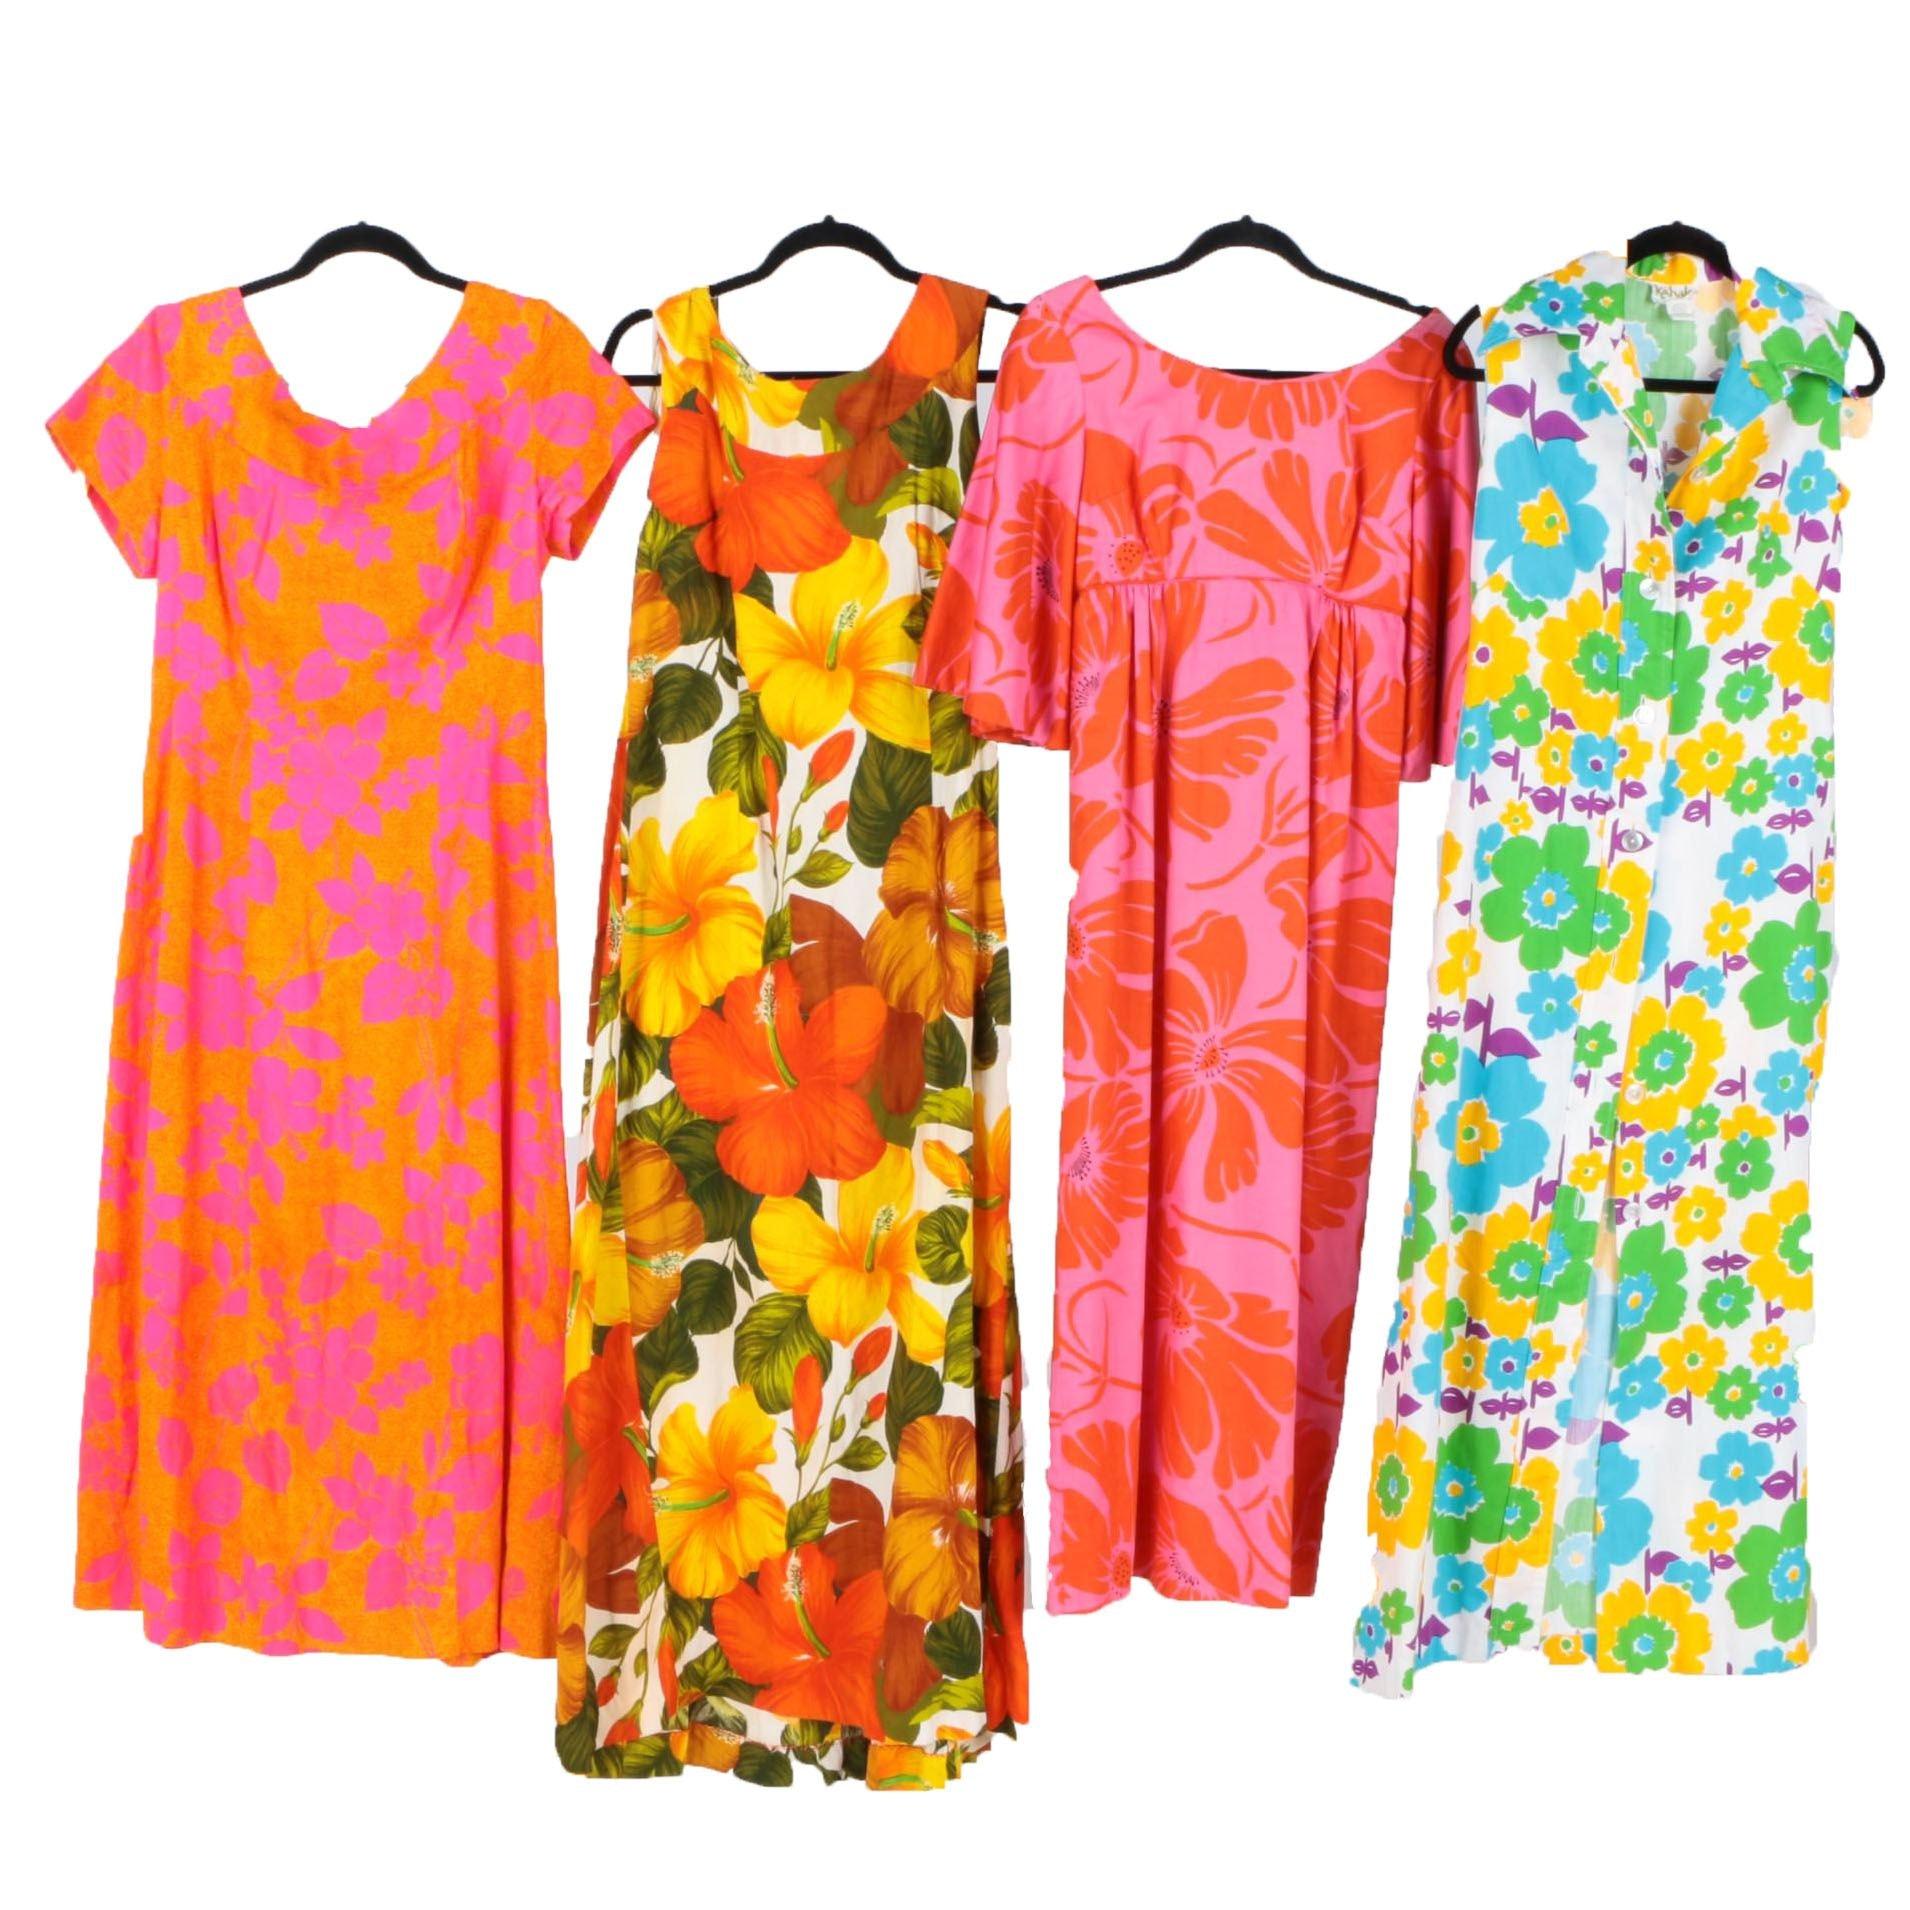 Vintage Hawaiian Women's Dresses